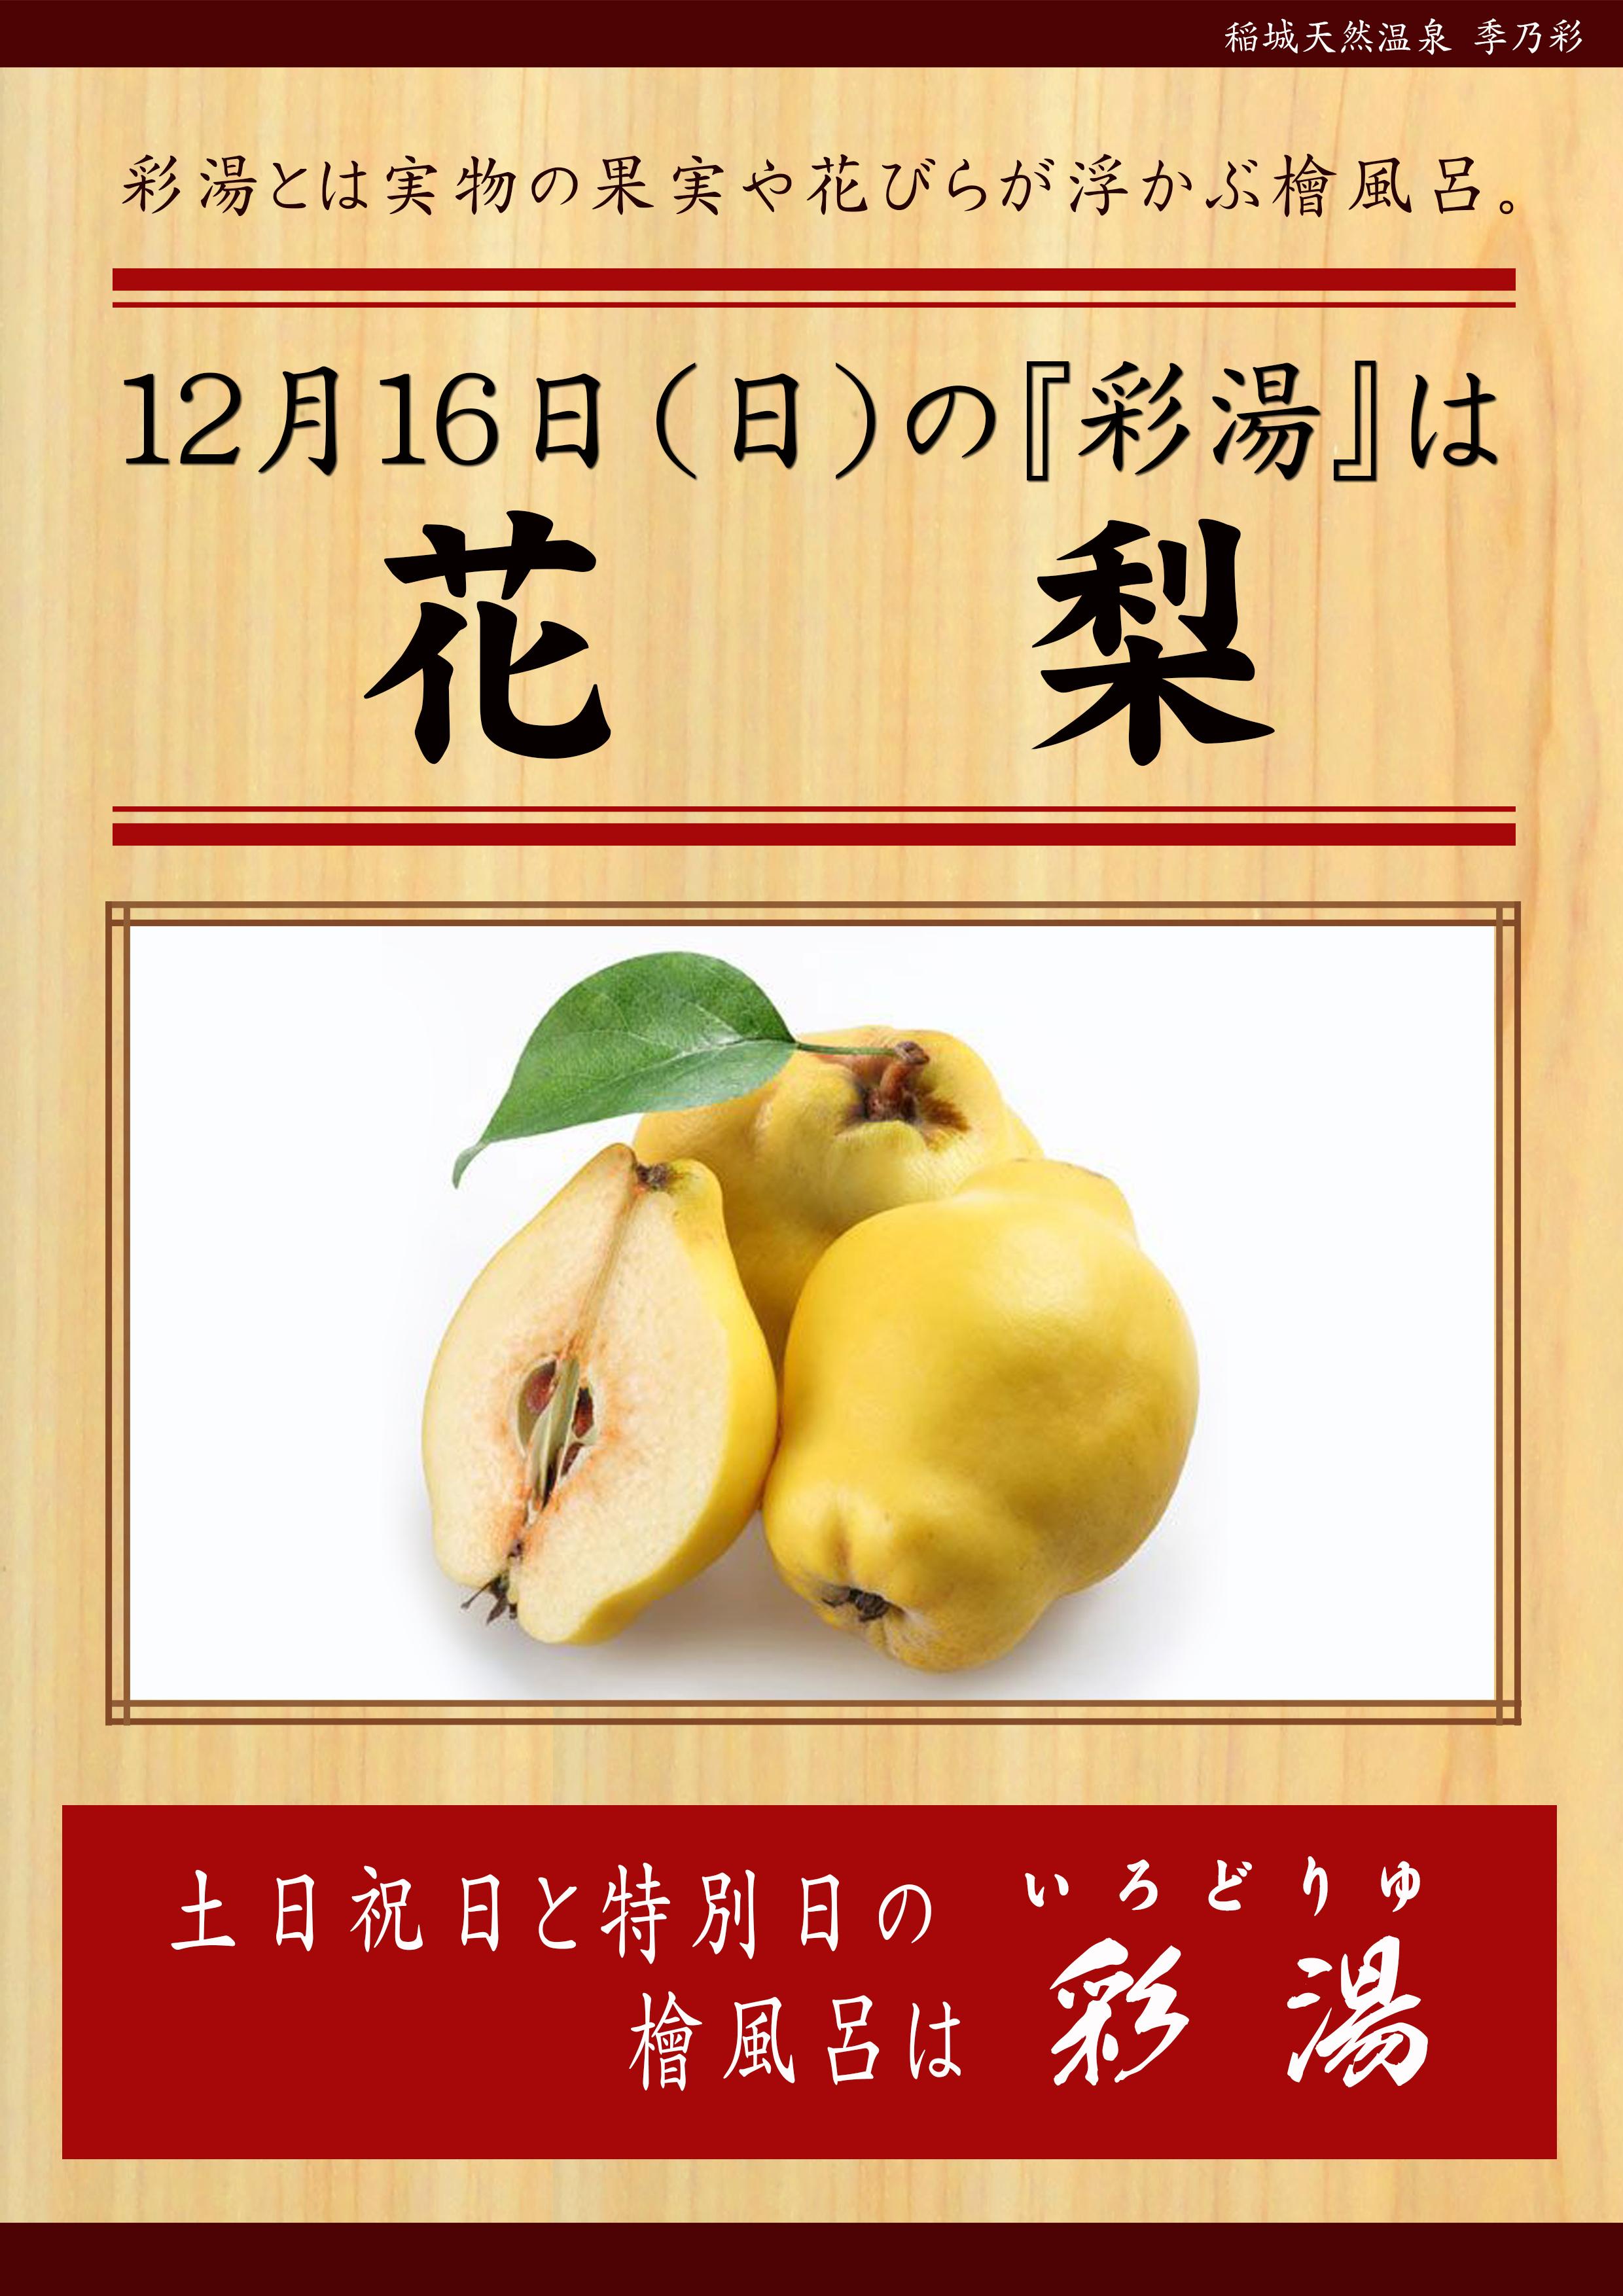 20181216POP イベント 彩湯 カリン